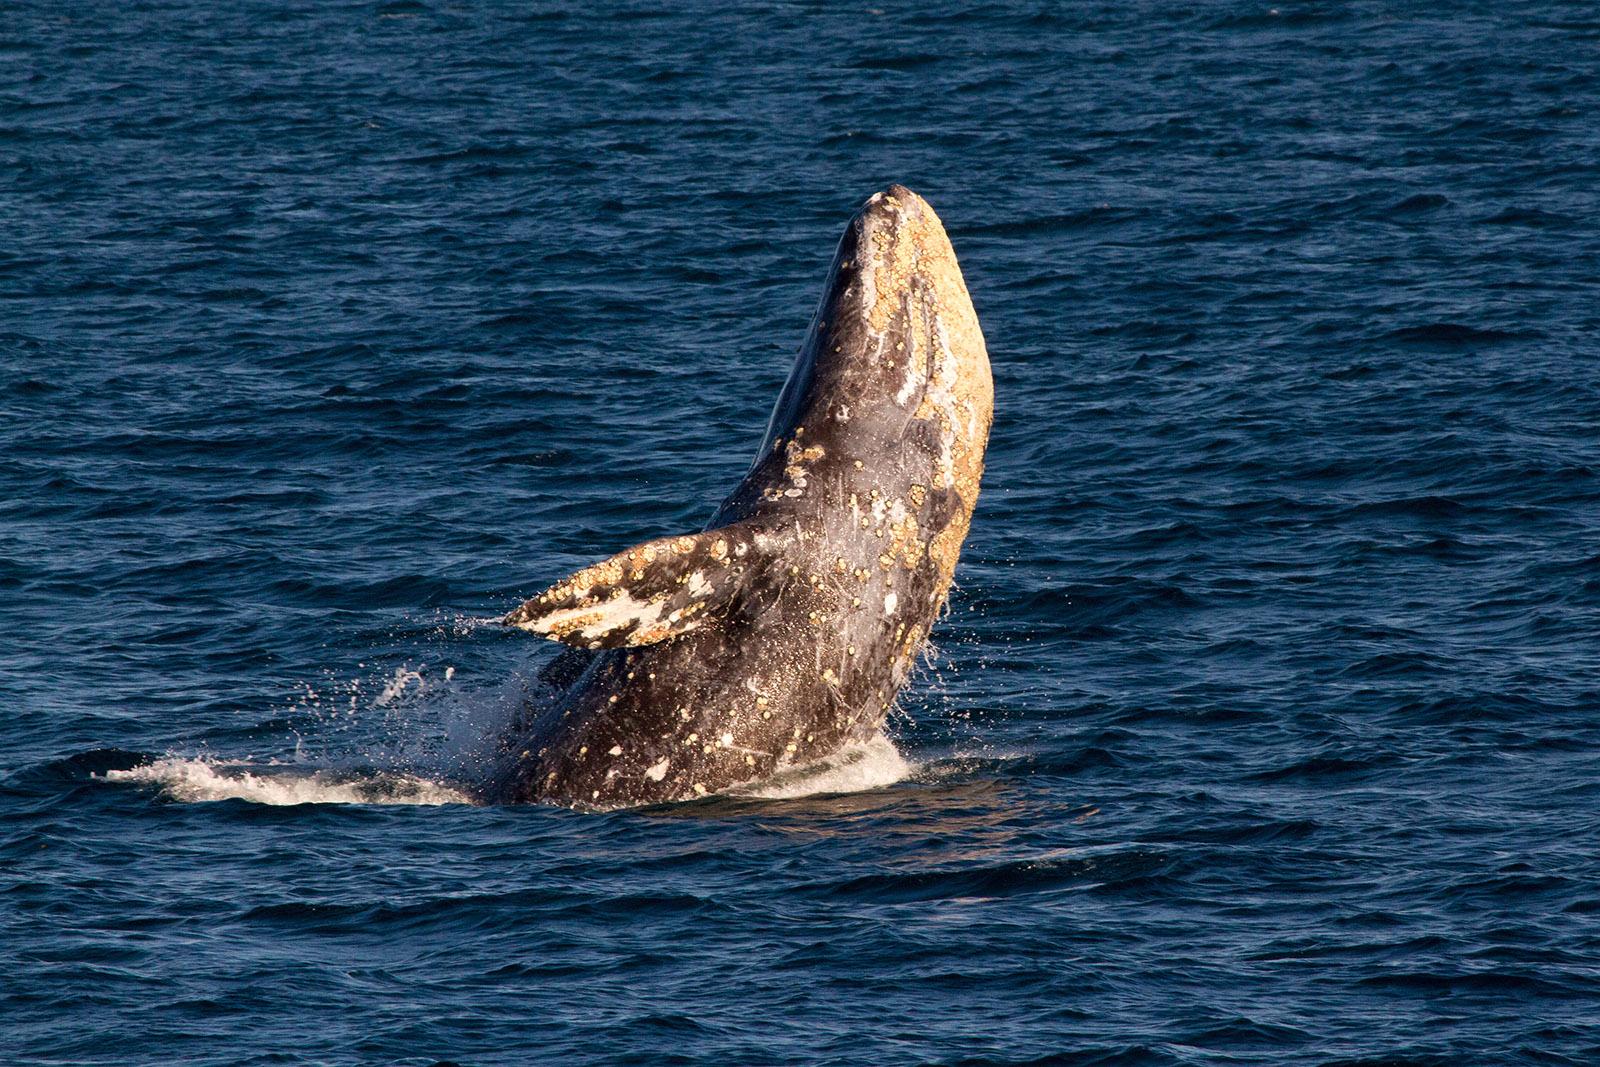 A Gray Whale breaches off the San Diego Coast. Photo Credit Bob Bolsinger.